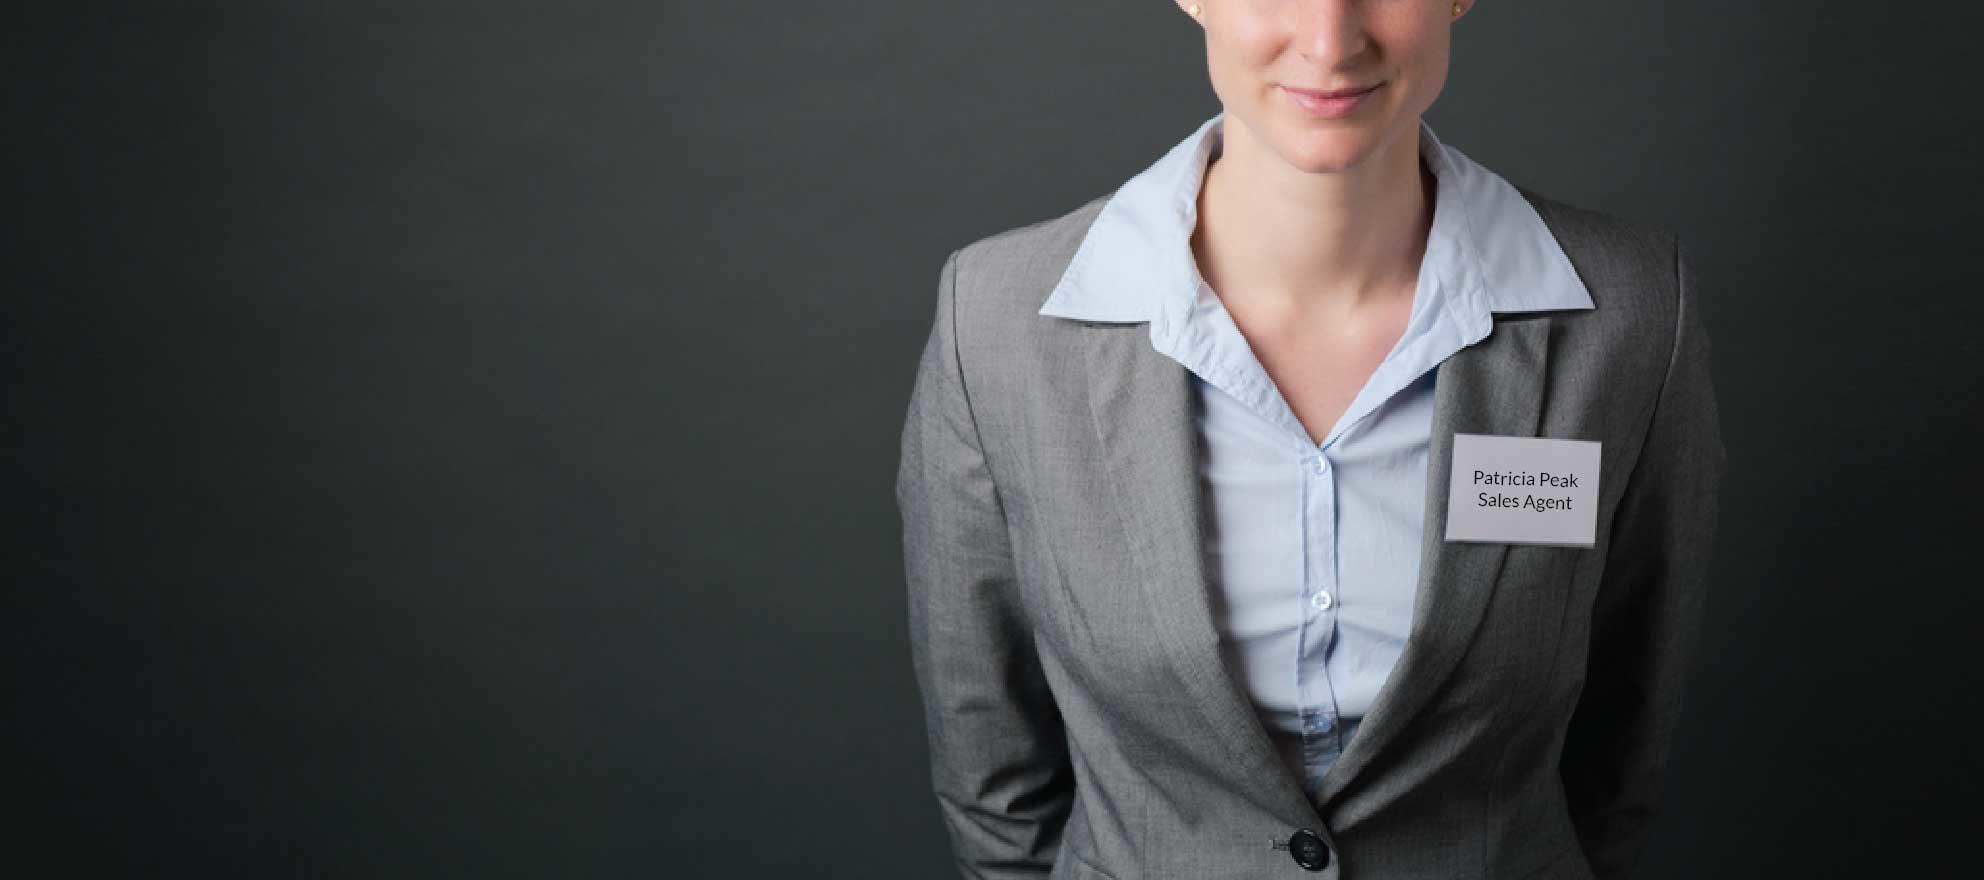 Eliminating the salesperson stigma in real estate